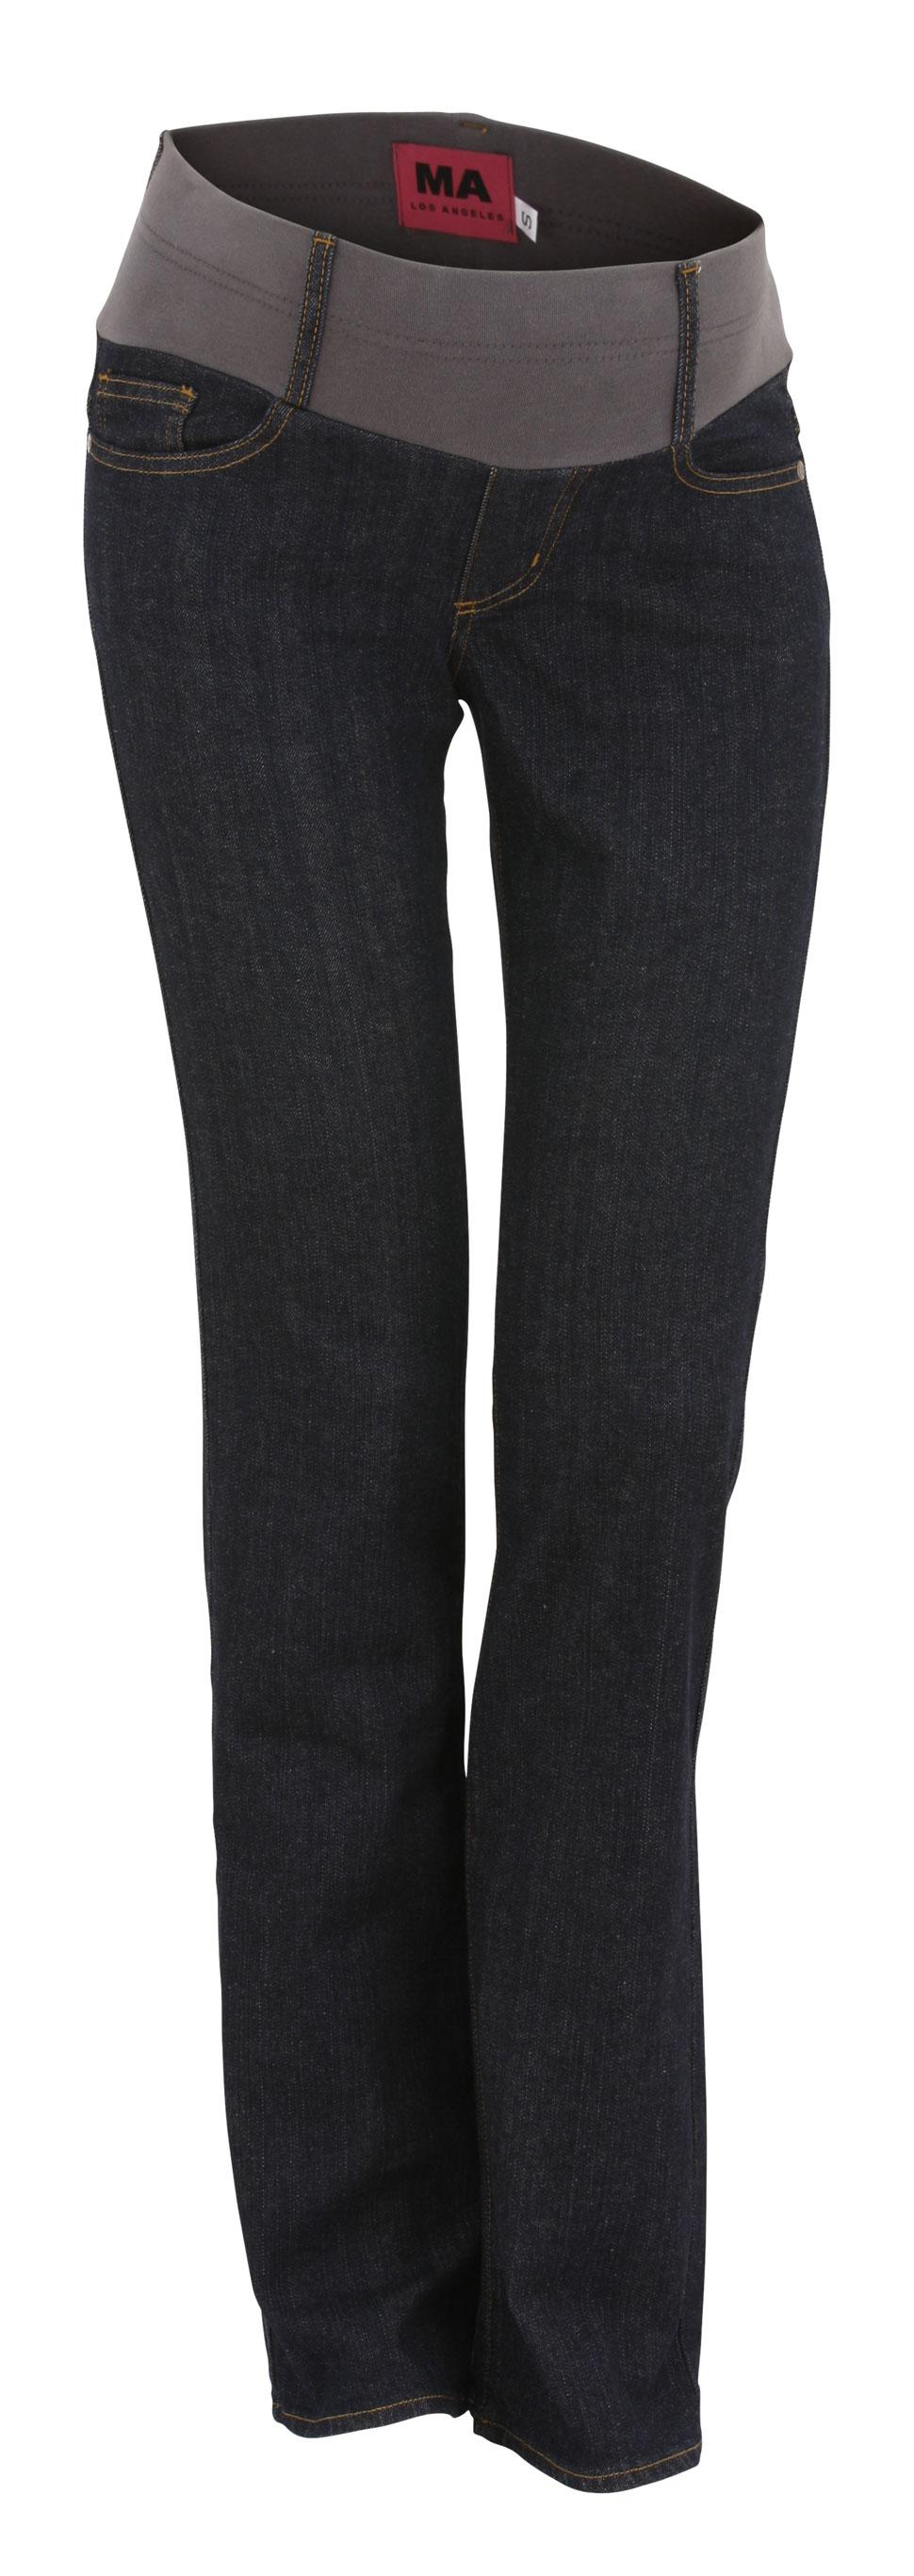 maternal-america-straight-half-panel-maternity-jeans-large.jpg